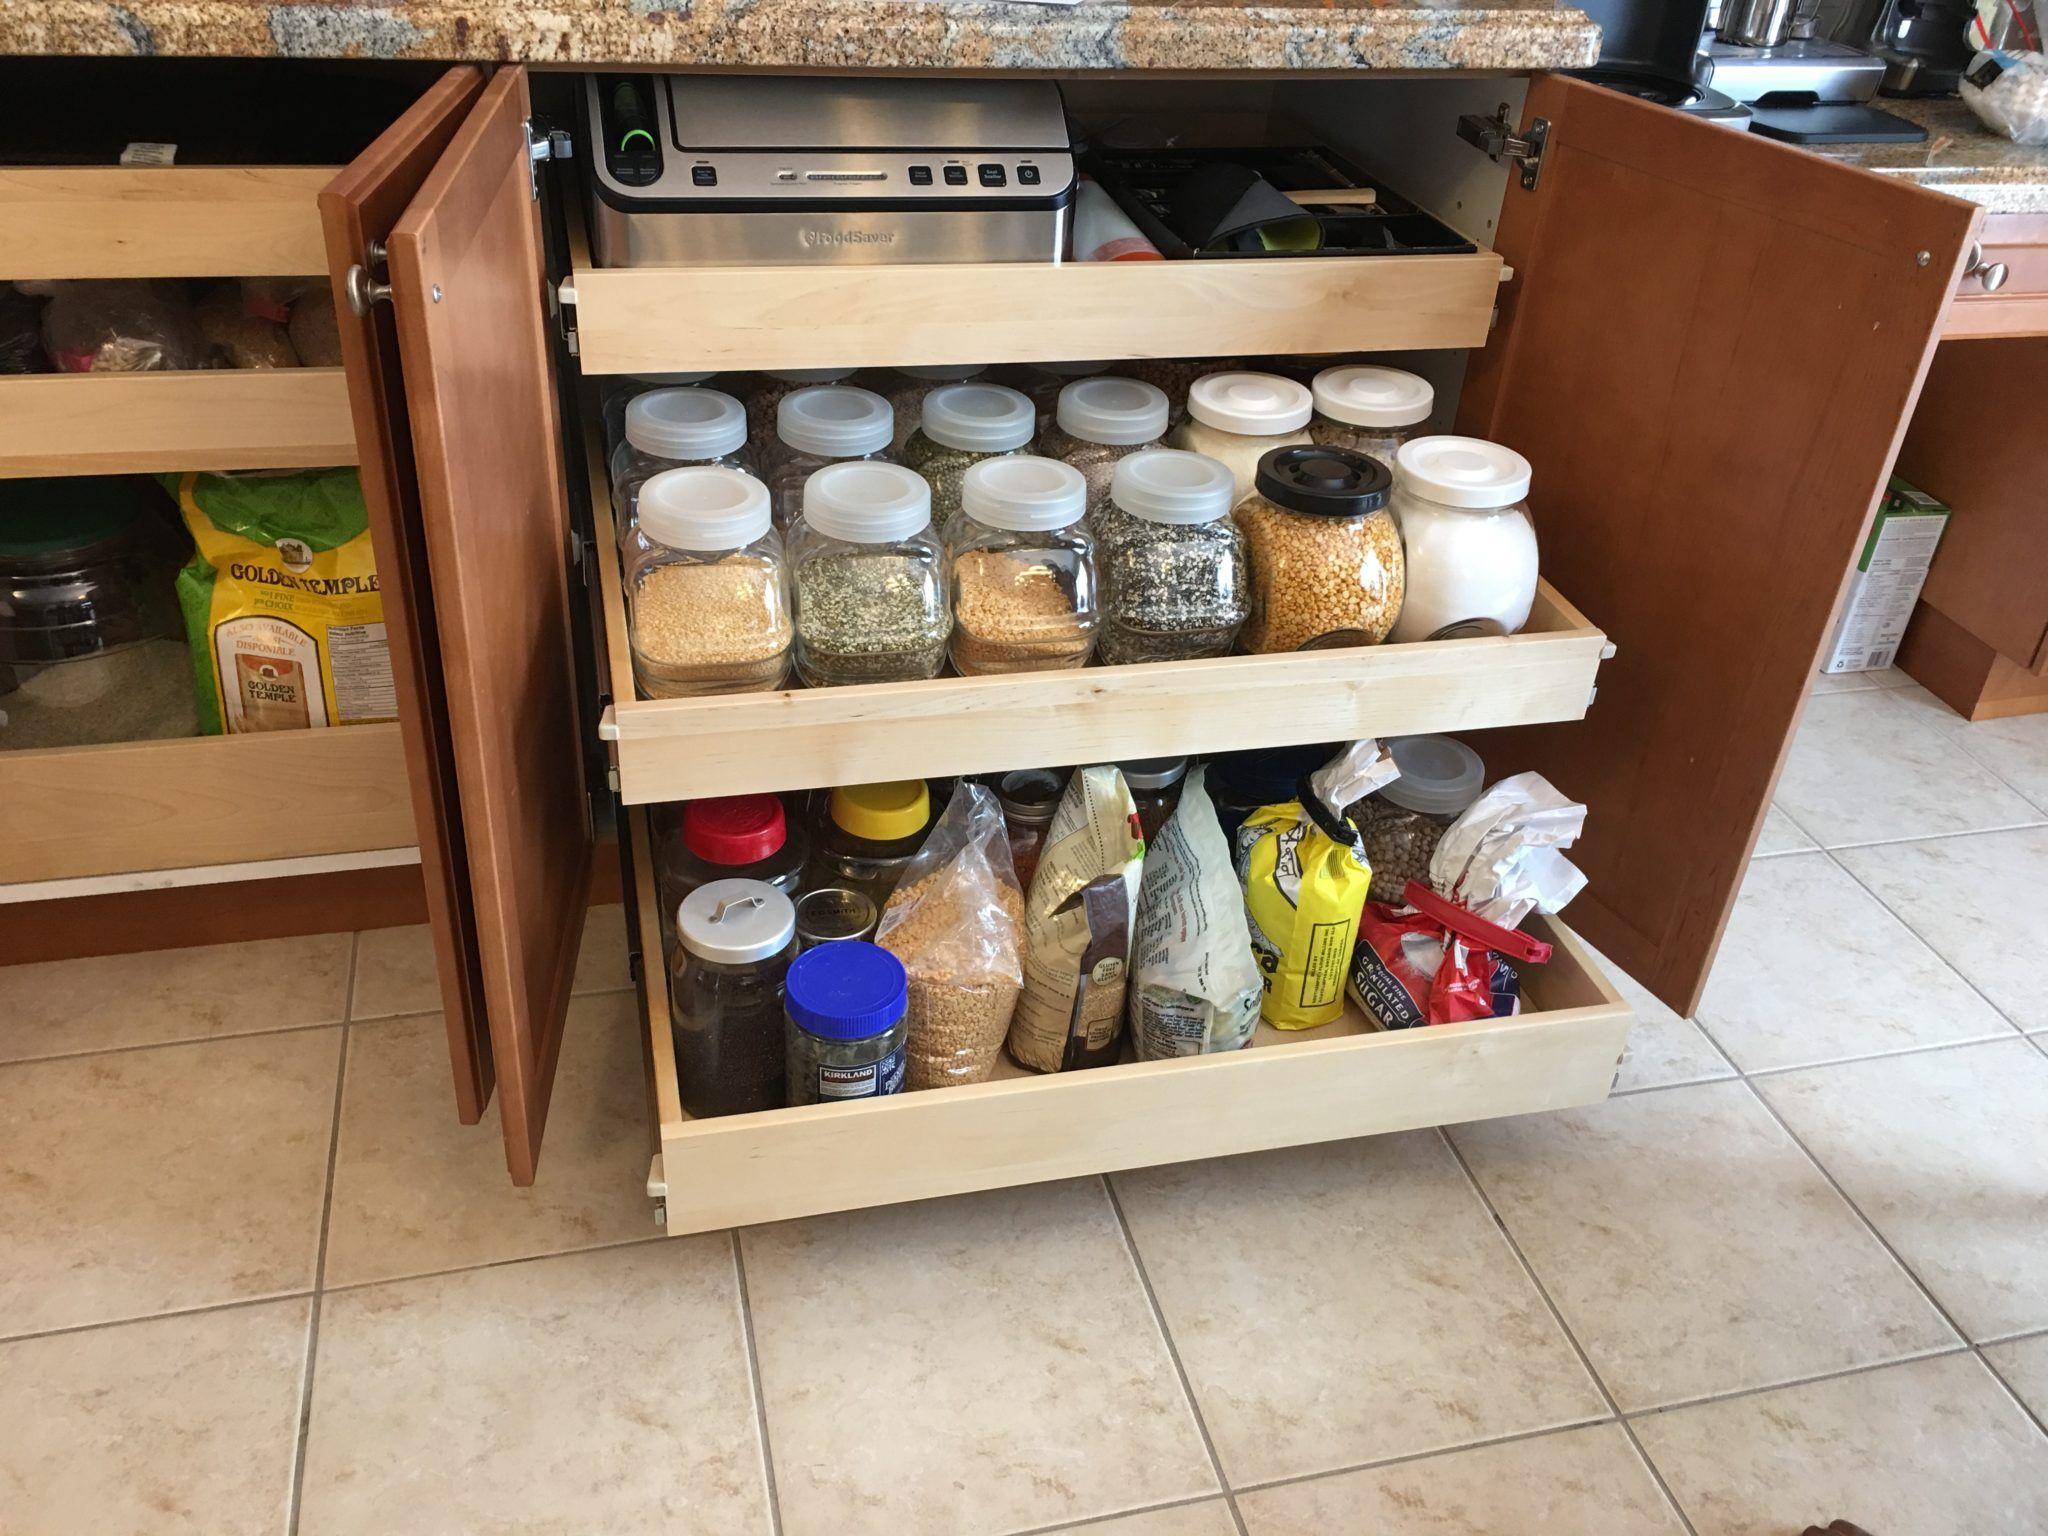 Custom Slide Out Shelving Inc.: Kitchen Pull Out Shelves ...